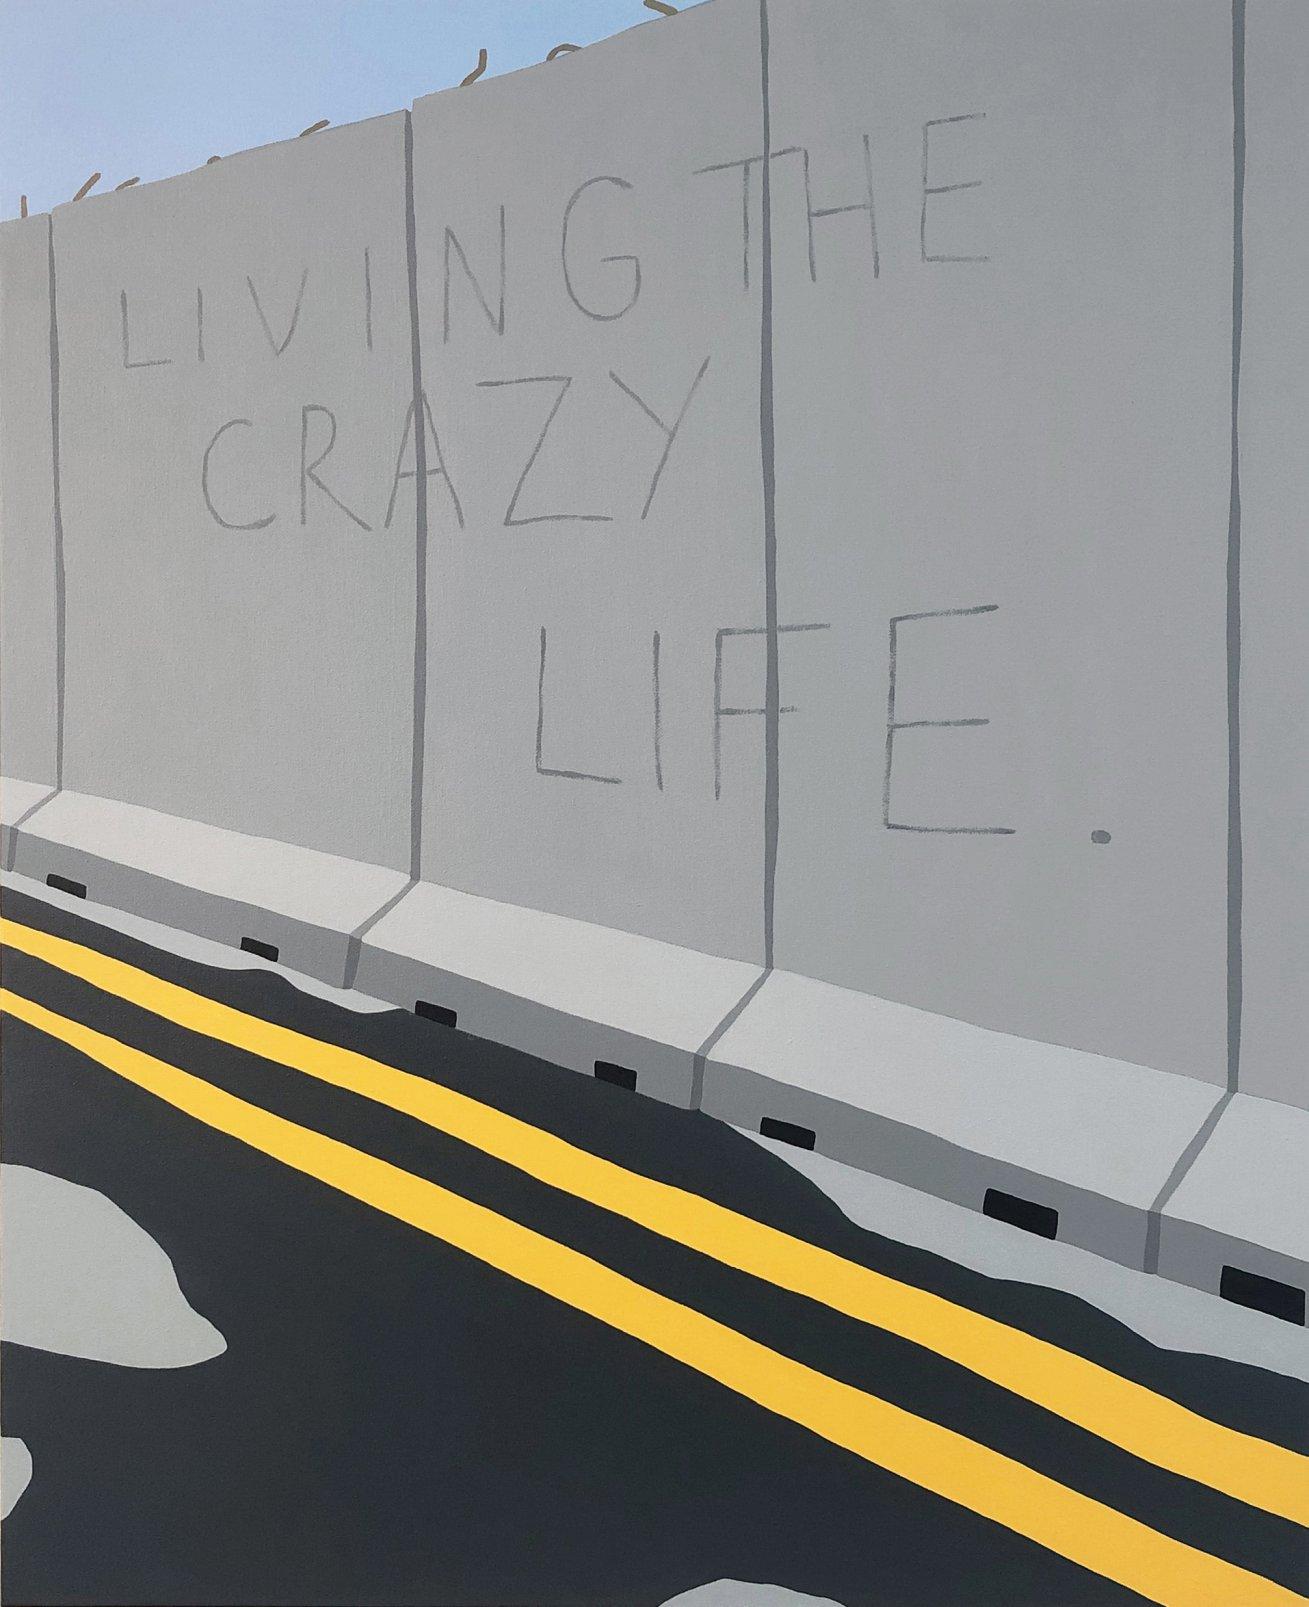 Living my crazy life (2019) - Luis Simó